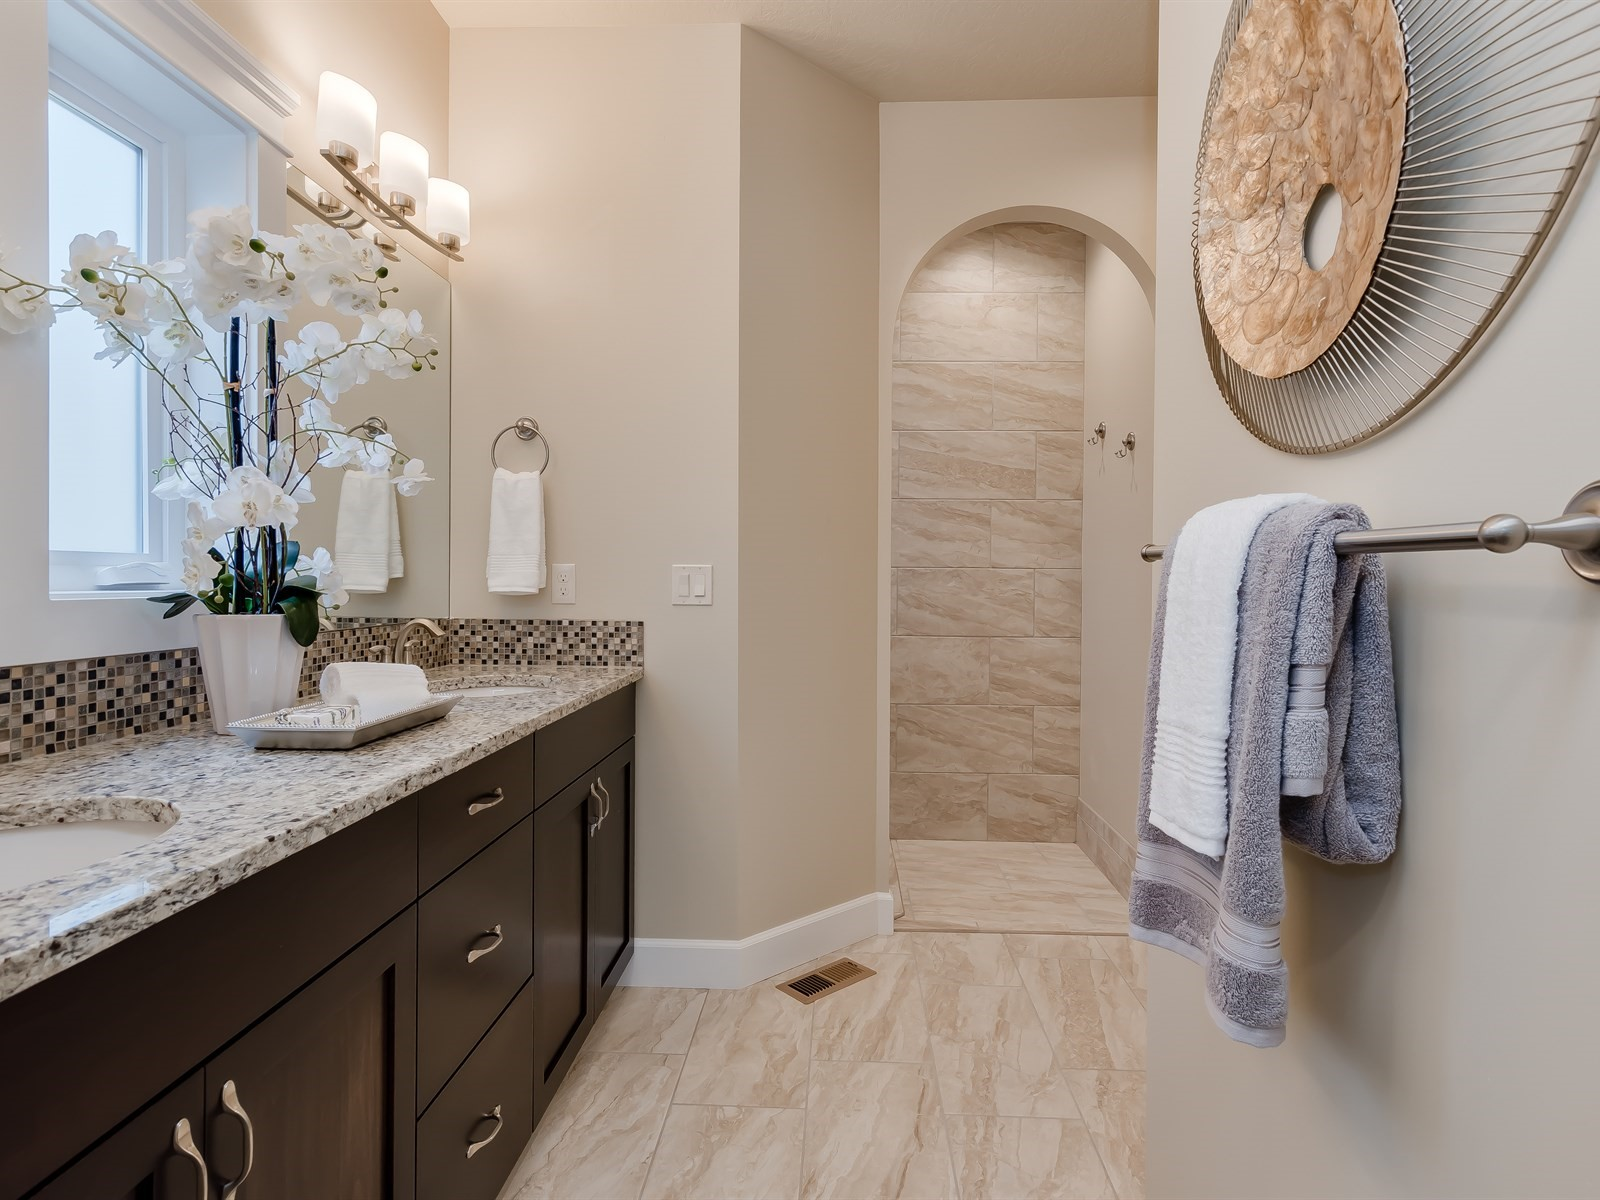 032_Master Bathroom.jpg